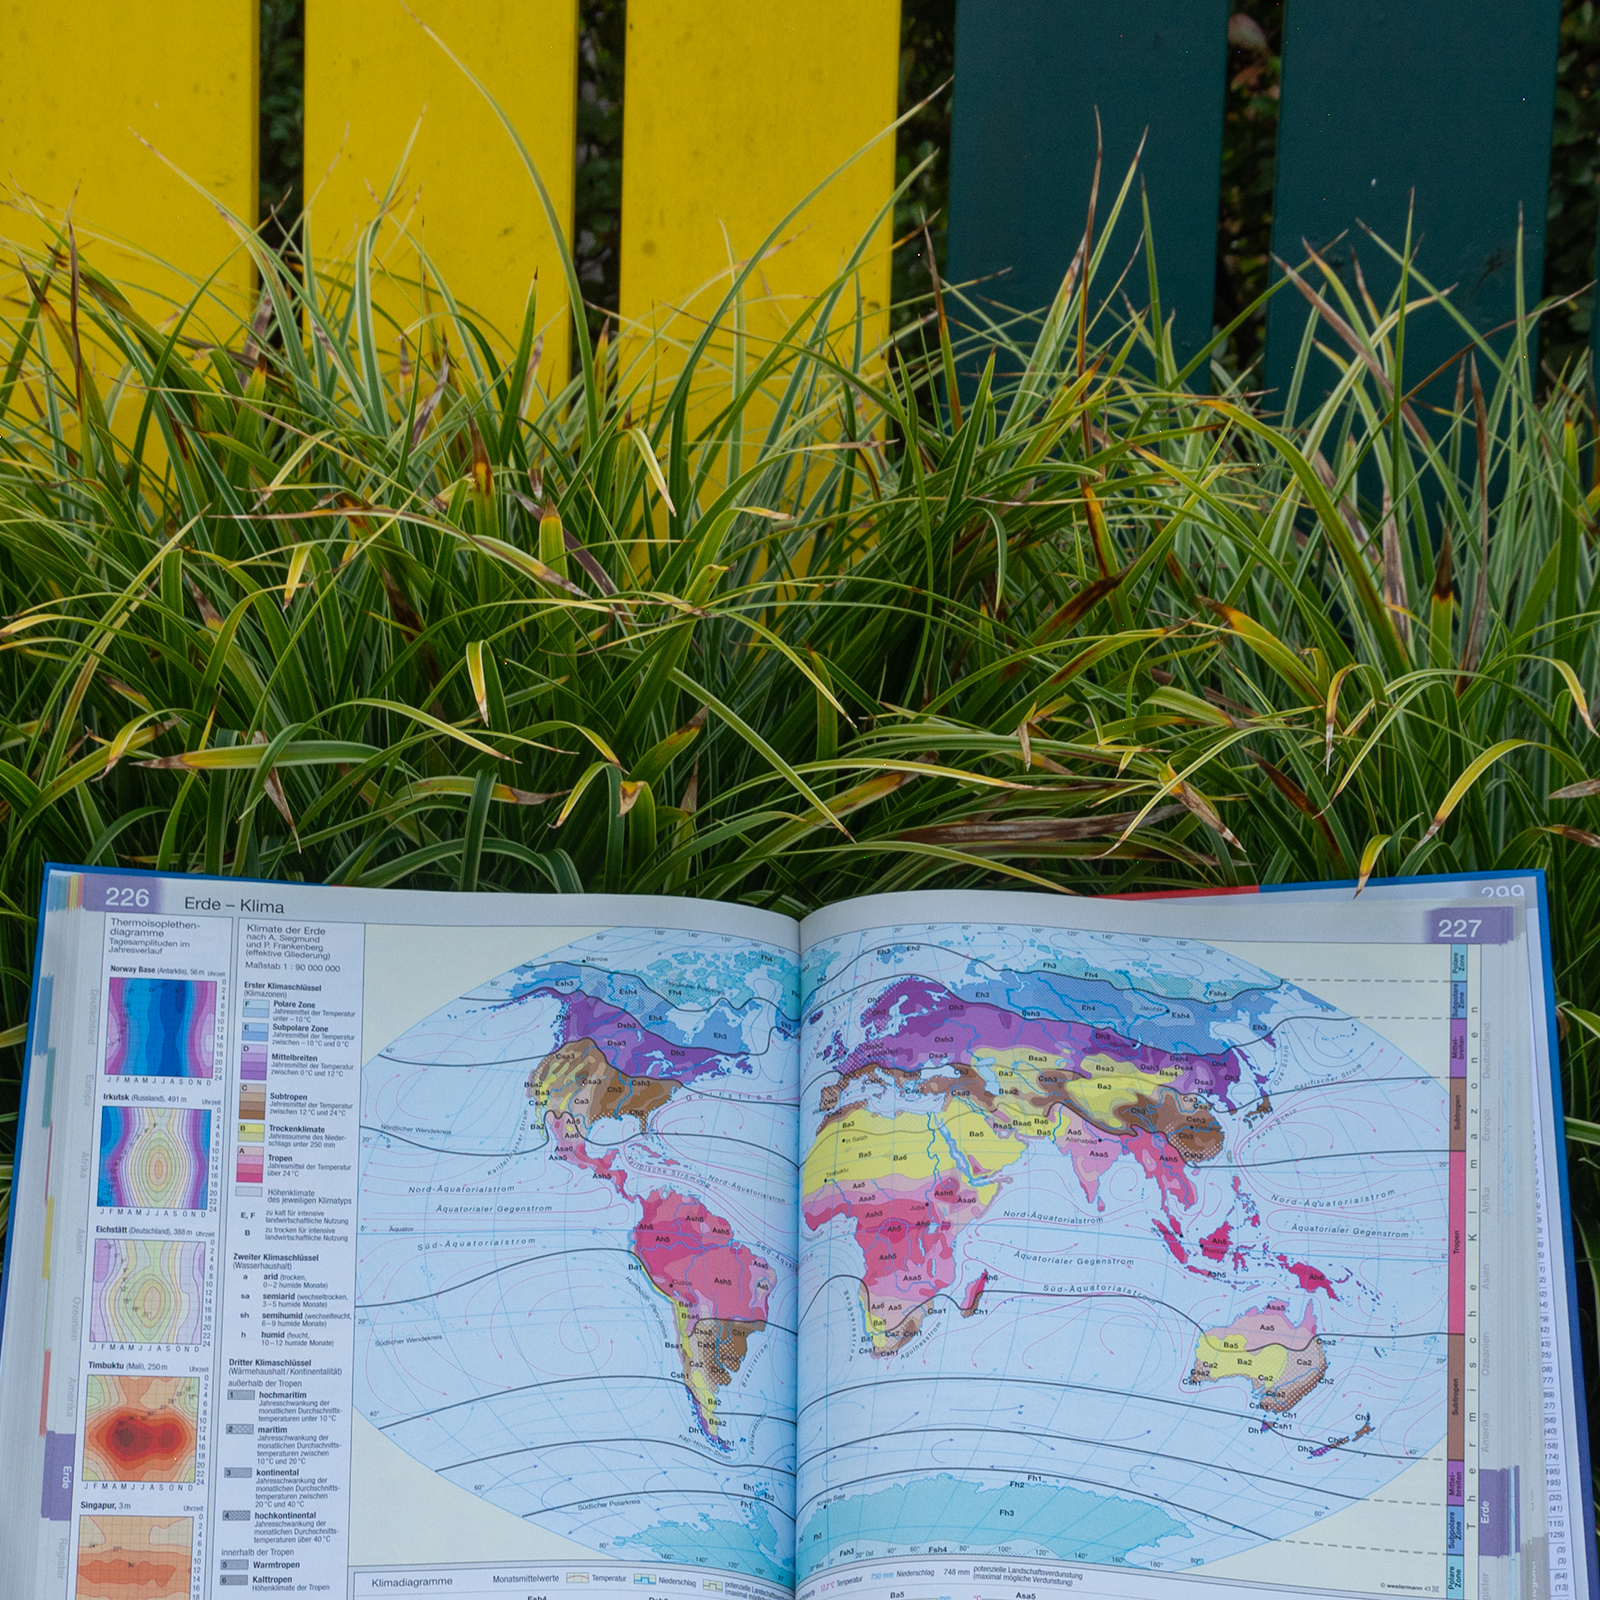 Landkarte; Weltkarte; Grün; Pflanzen; City-Maut; Norwegen